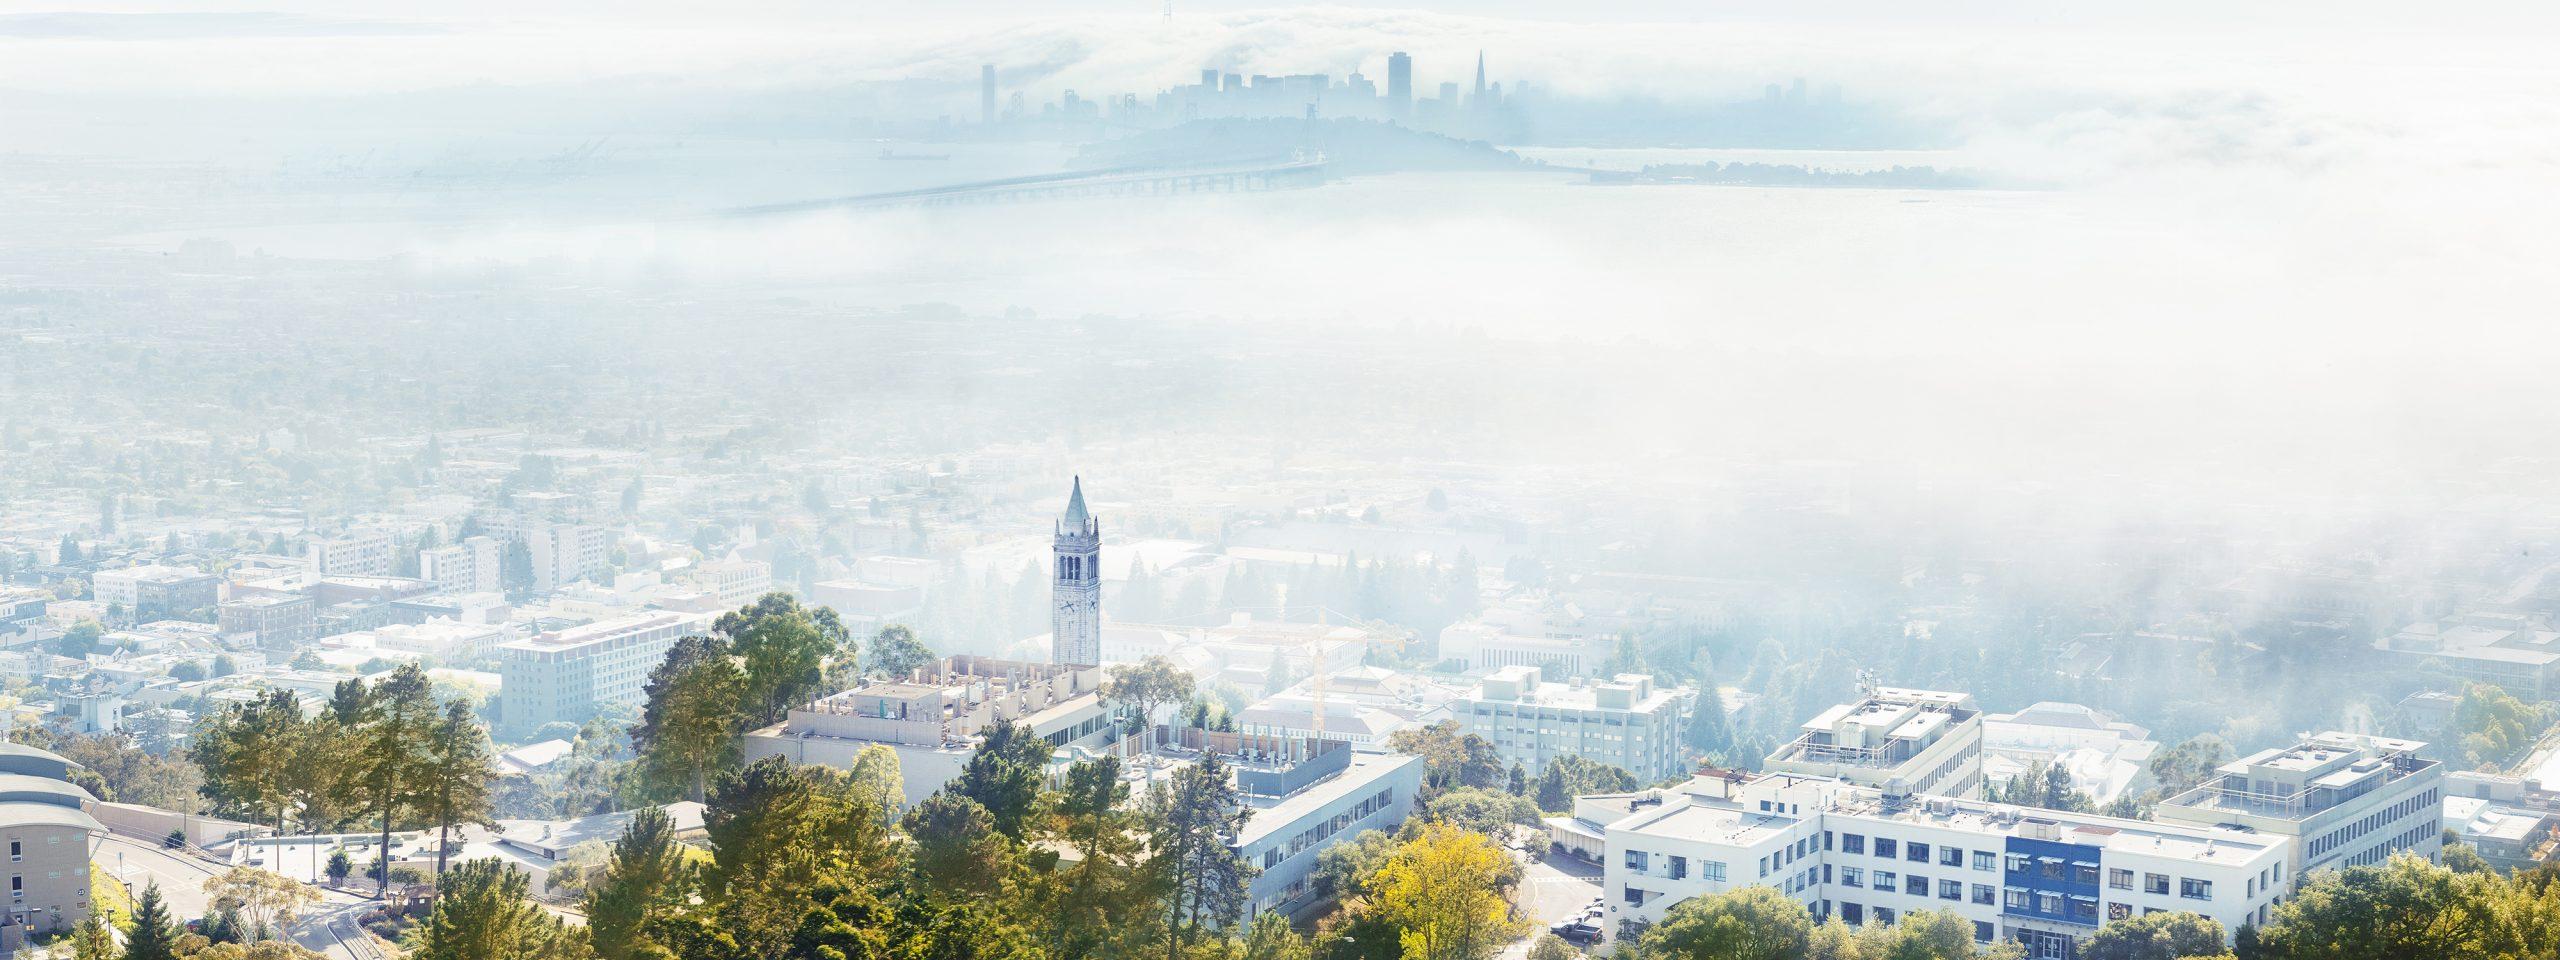 Arial photo of UC Berkeley campus